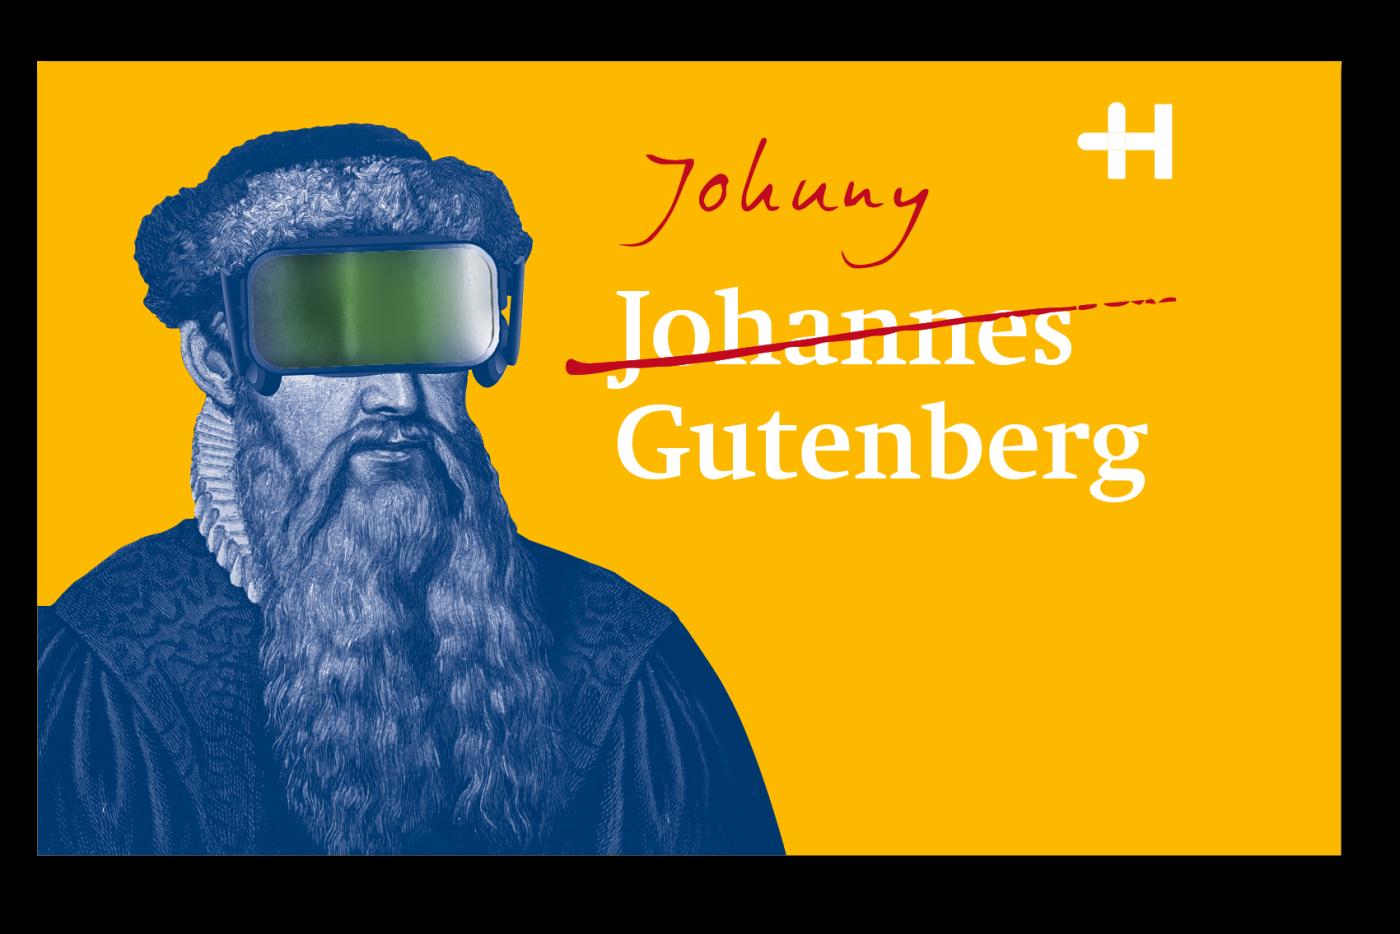 2019-05-27-HDM_Postkarten_Johnny